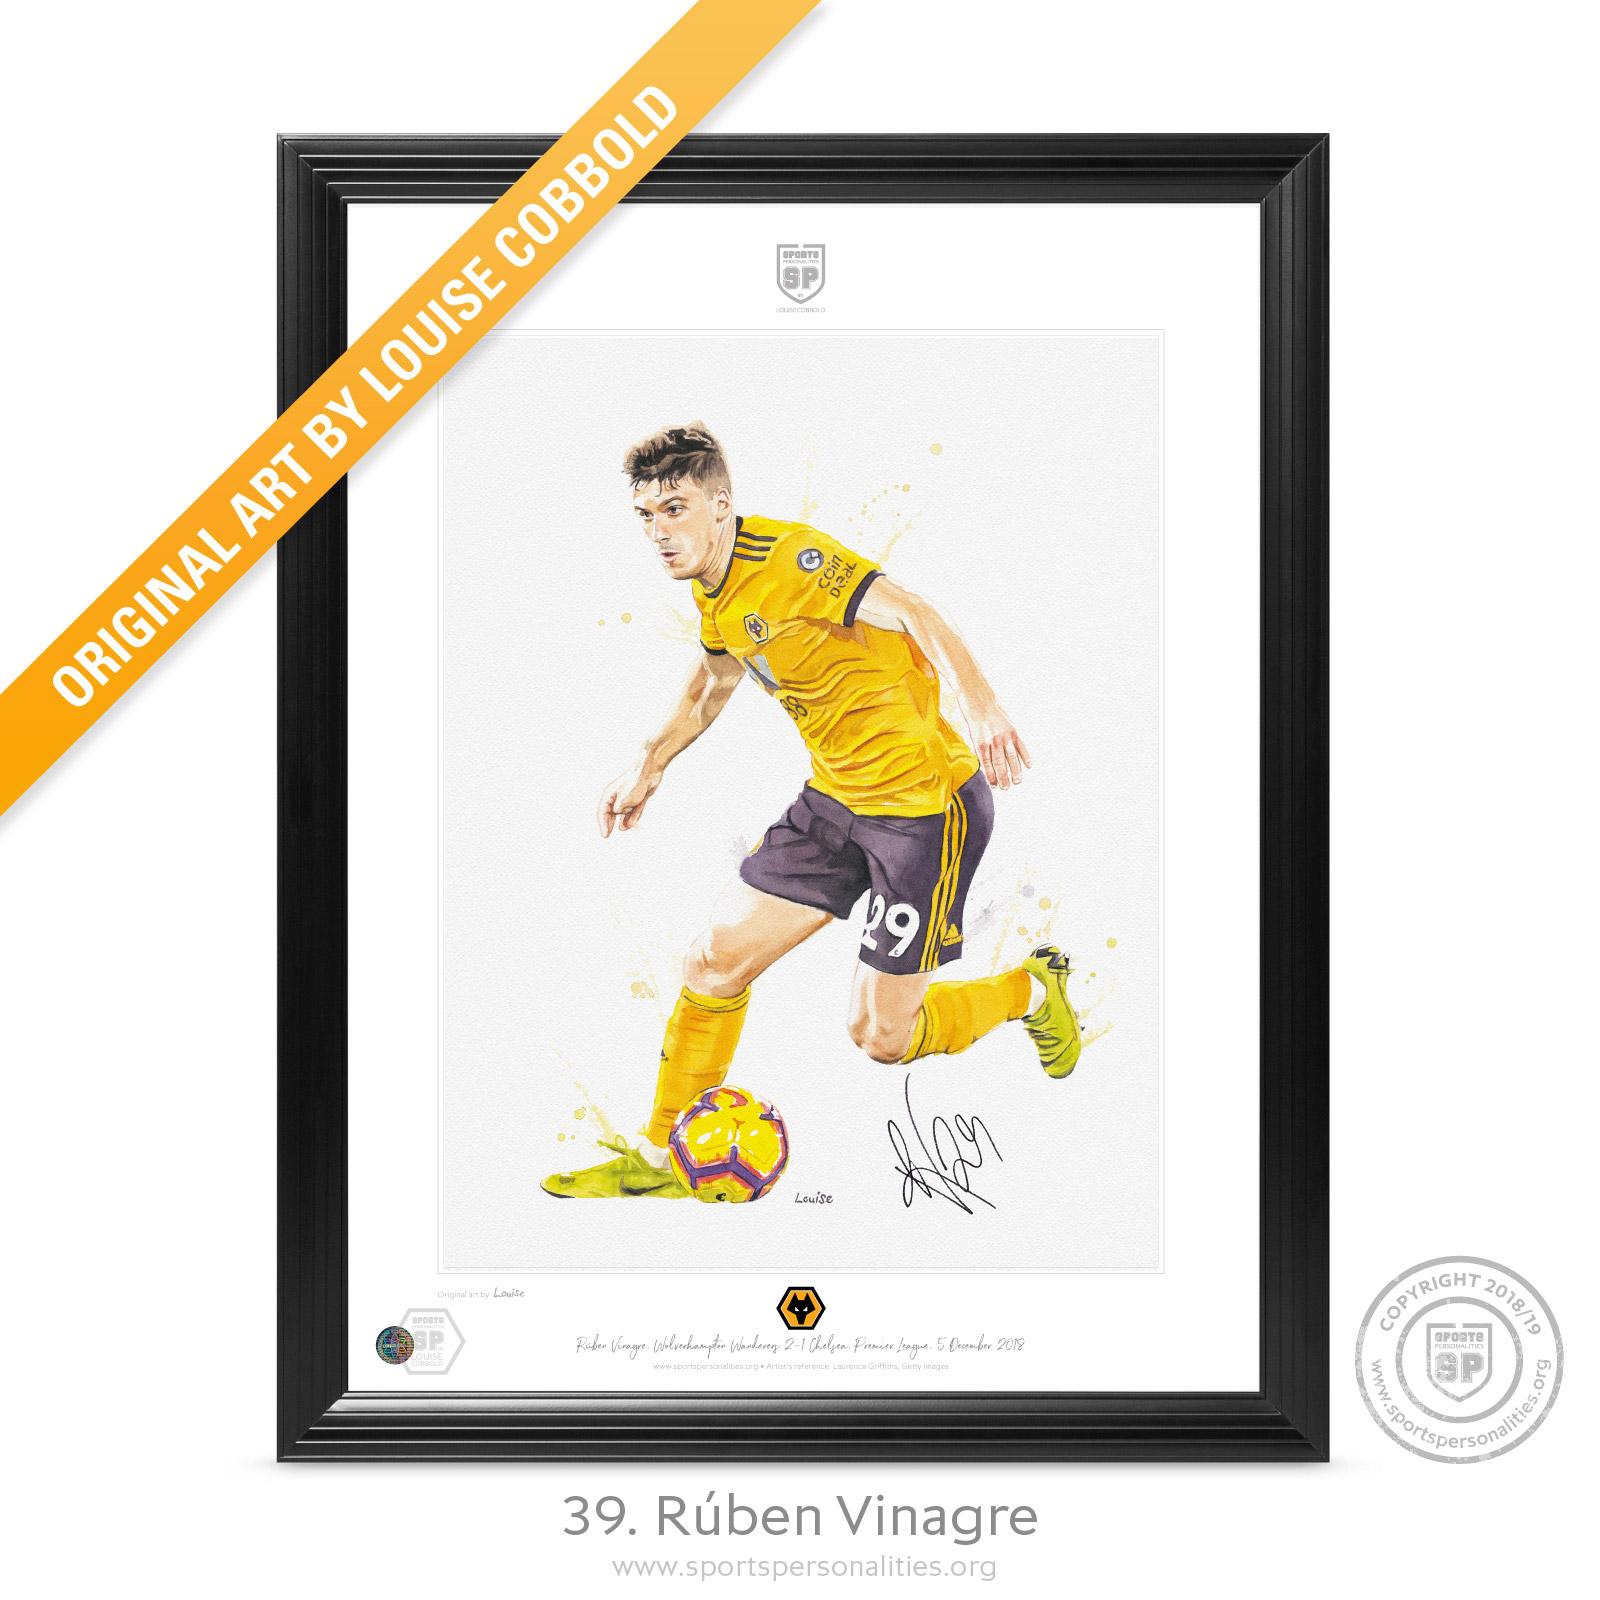 39.-Ruben-Vinagre.jpg